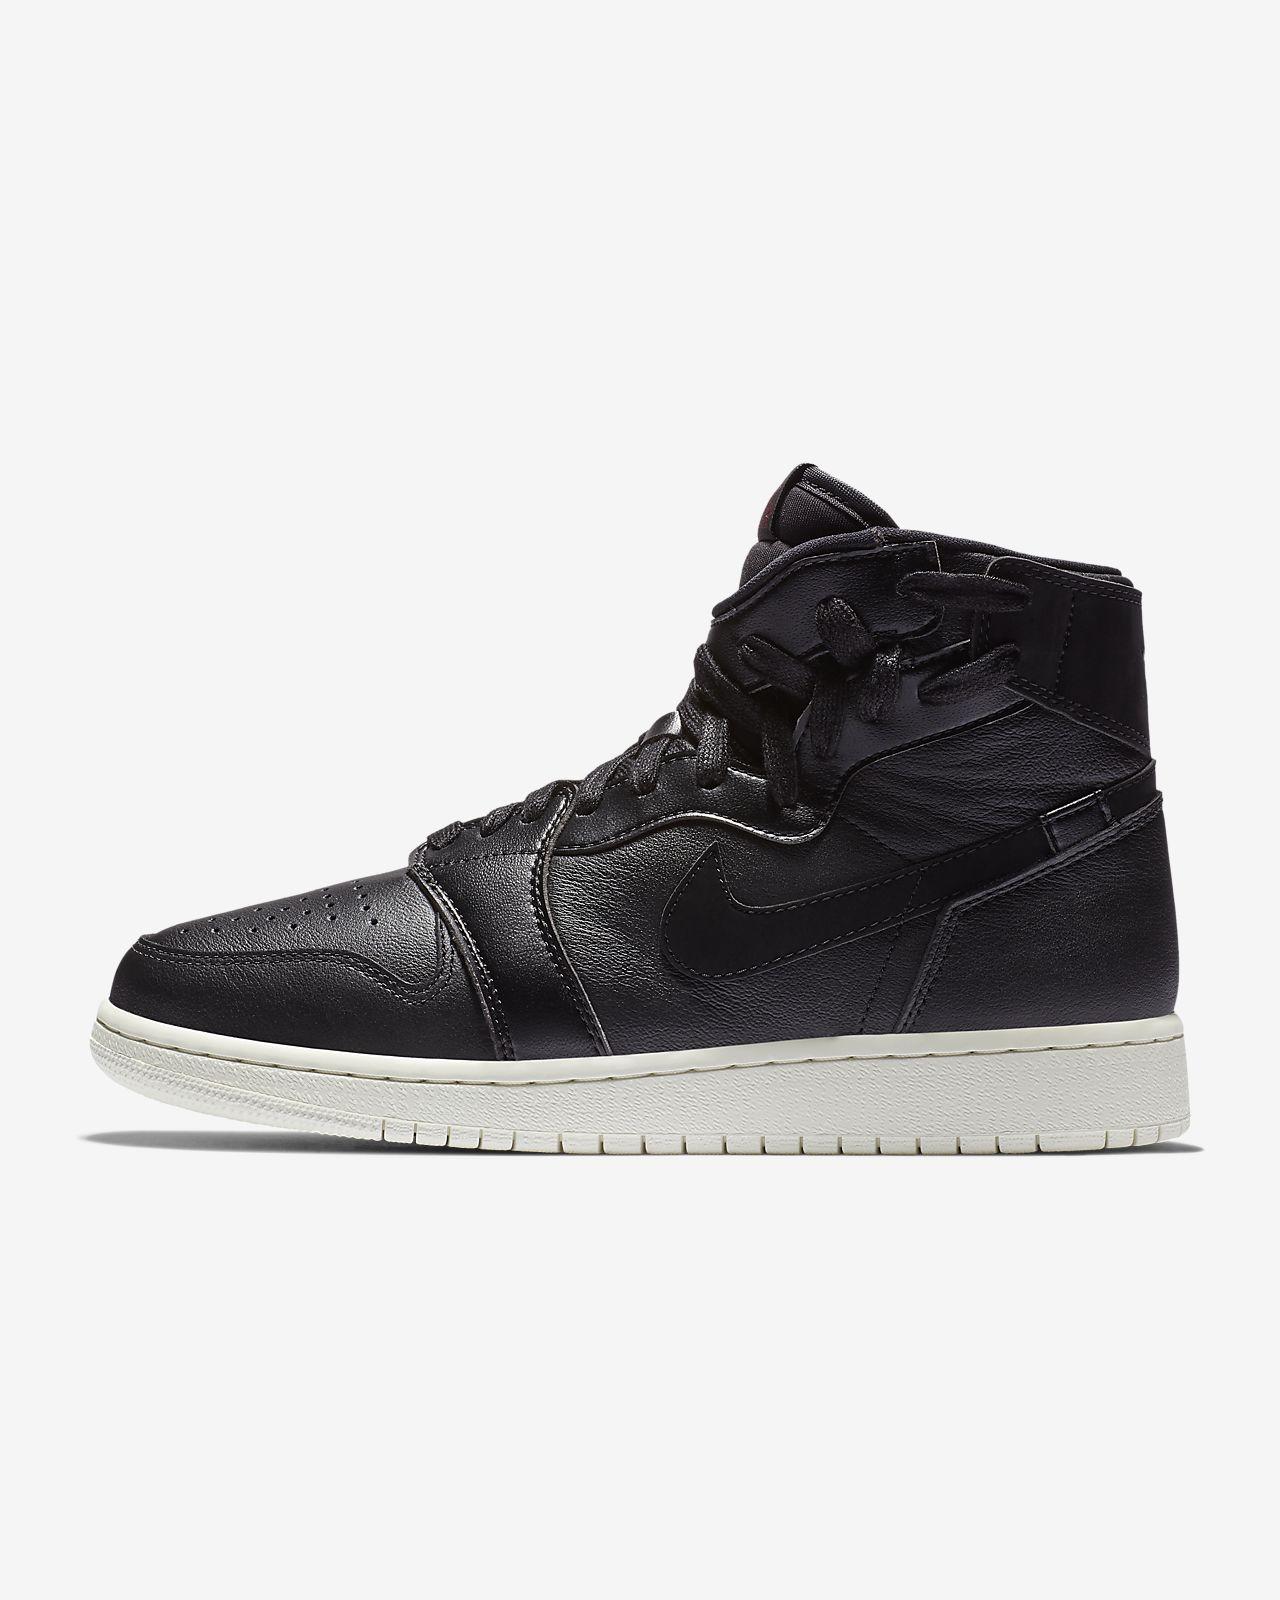 0aceb046284d Air Jordan 1 Rebel XX Women s Shoe. Nike.com AU